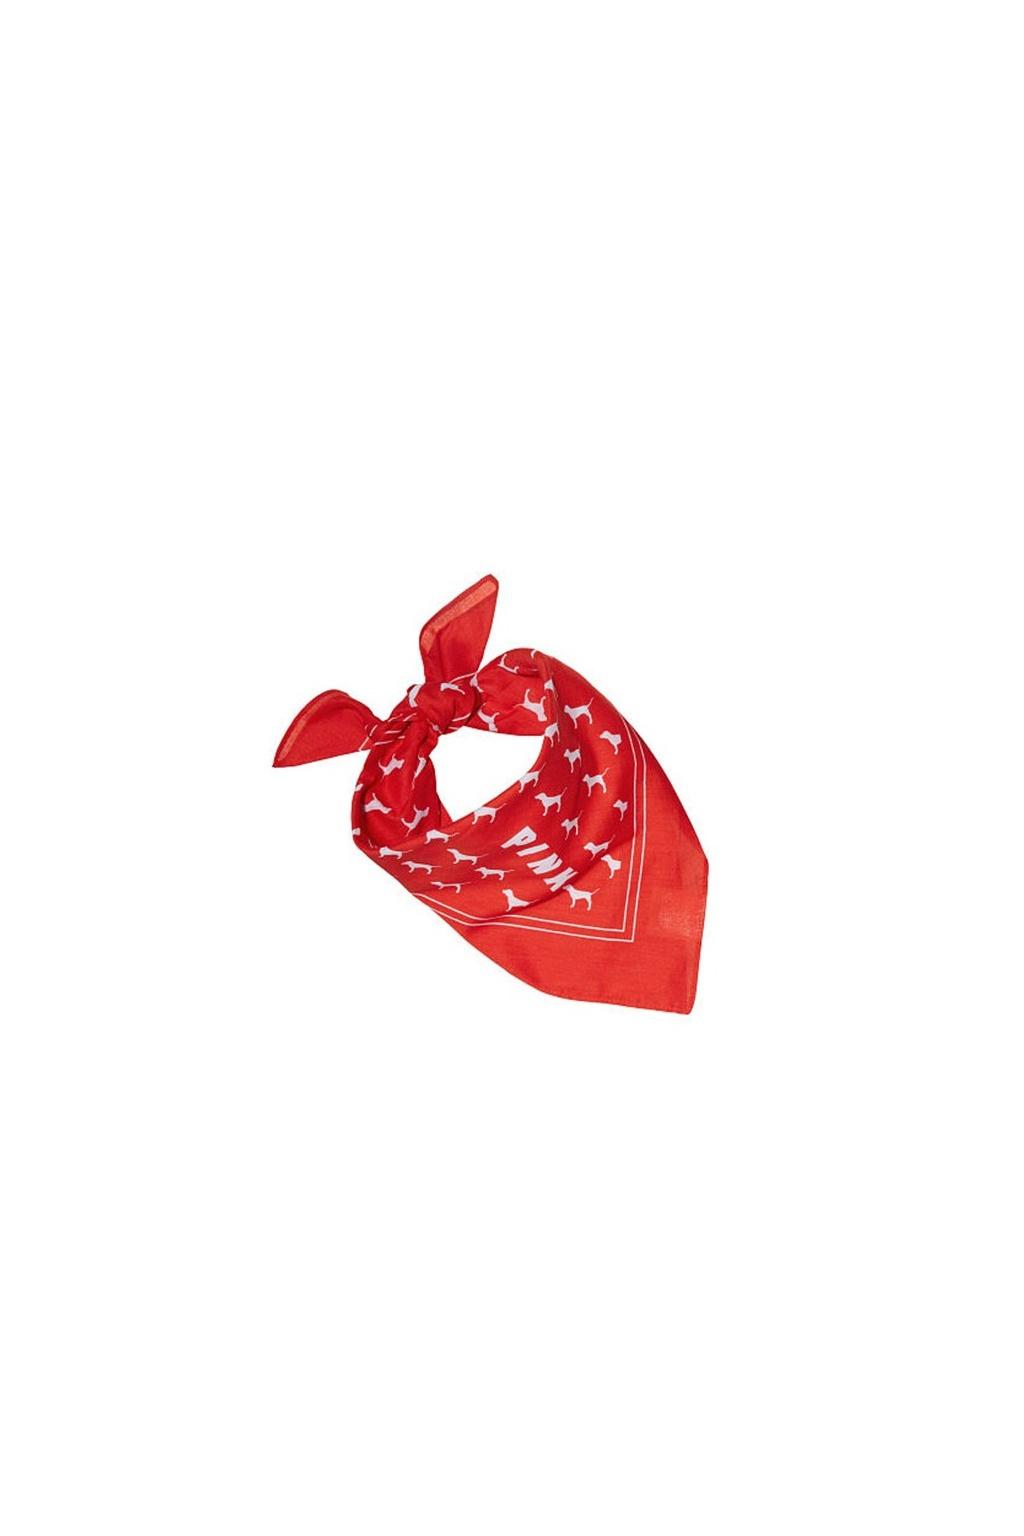 satek victoria s secret bandana cerveny w